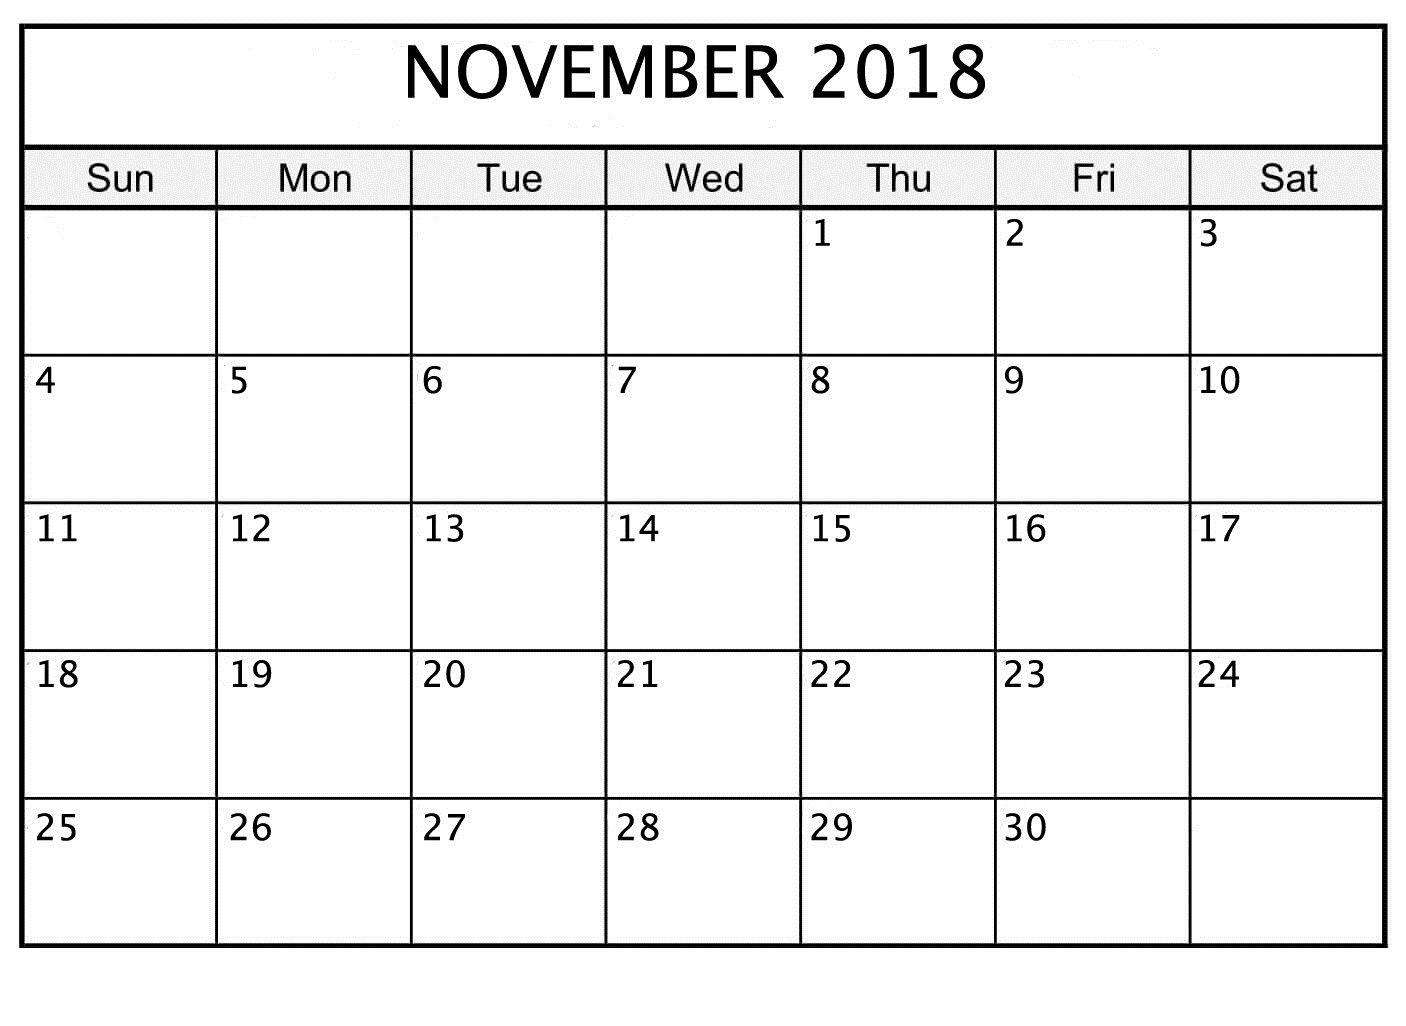 November 2018 Printable Calendar Date And Time   November 2018